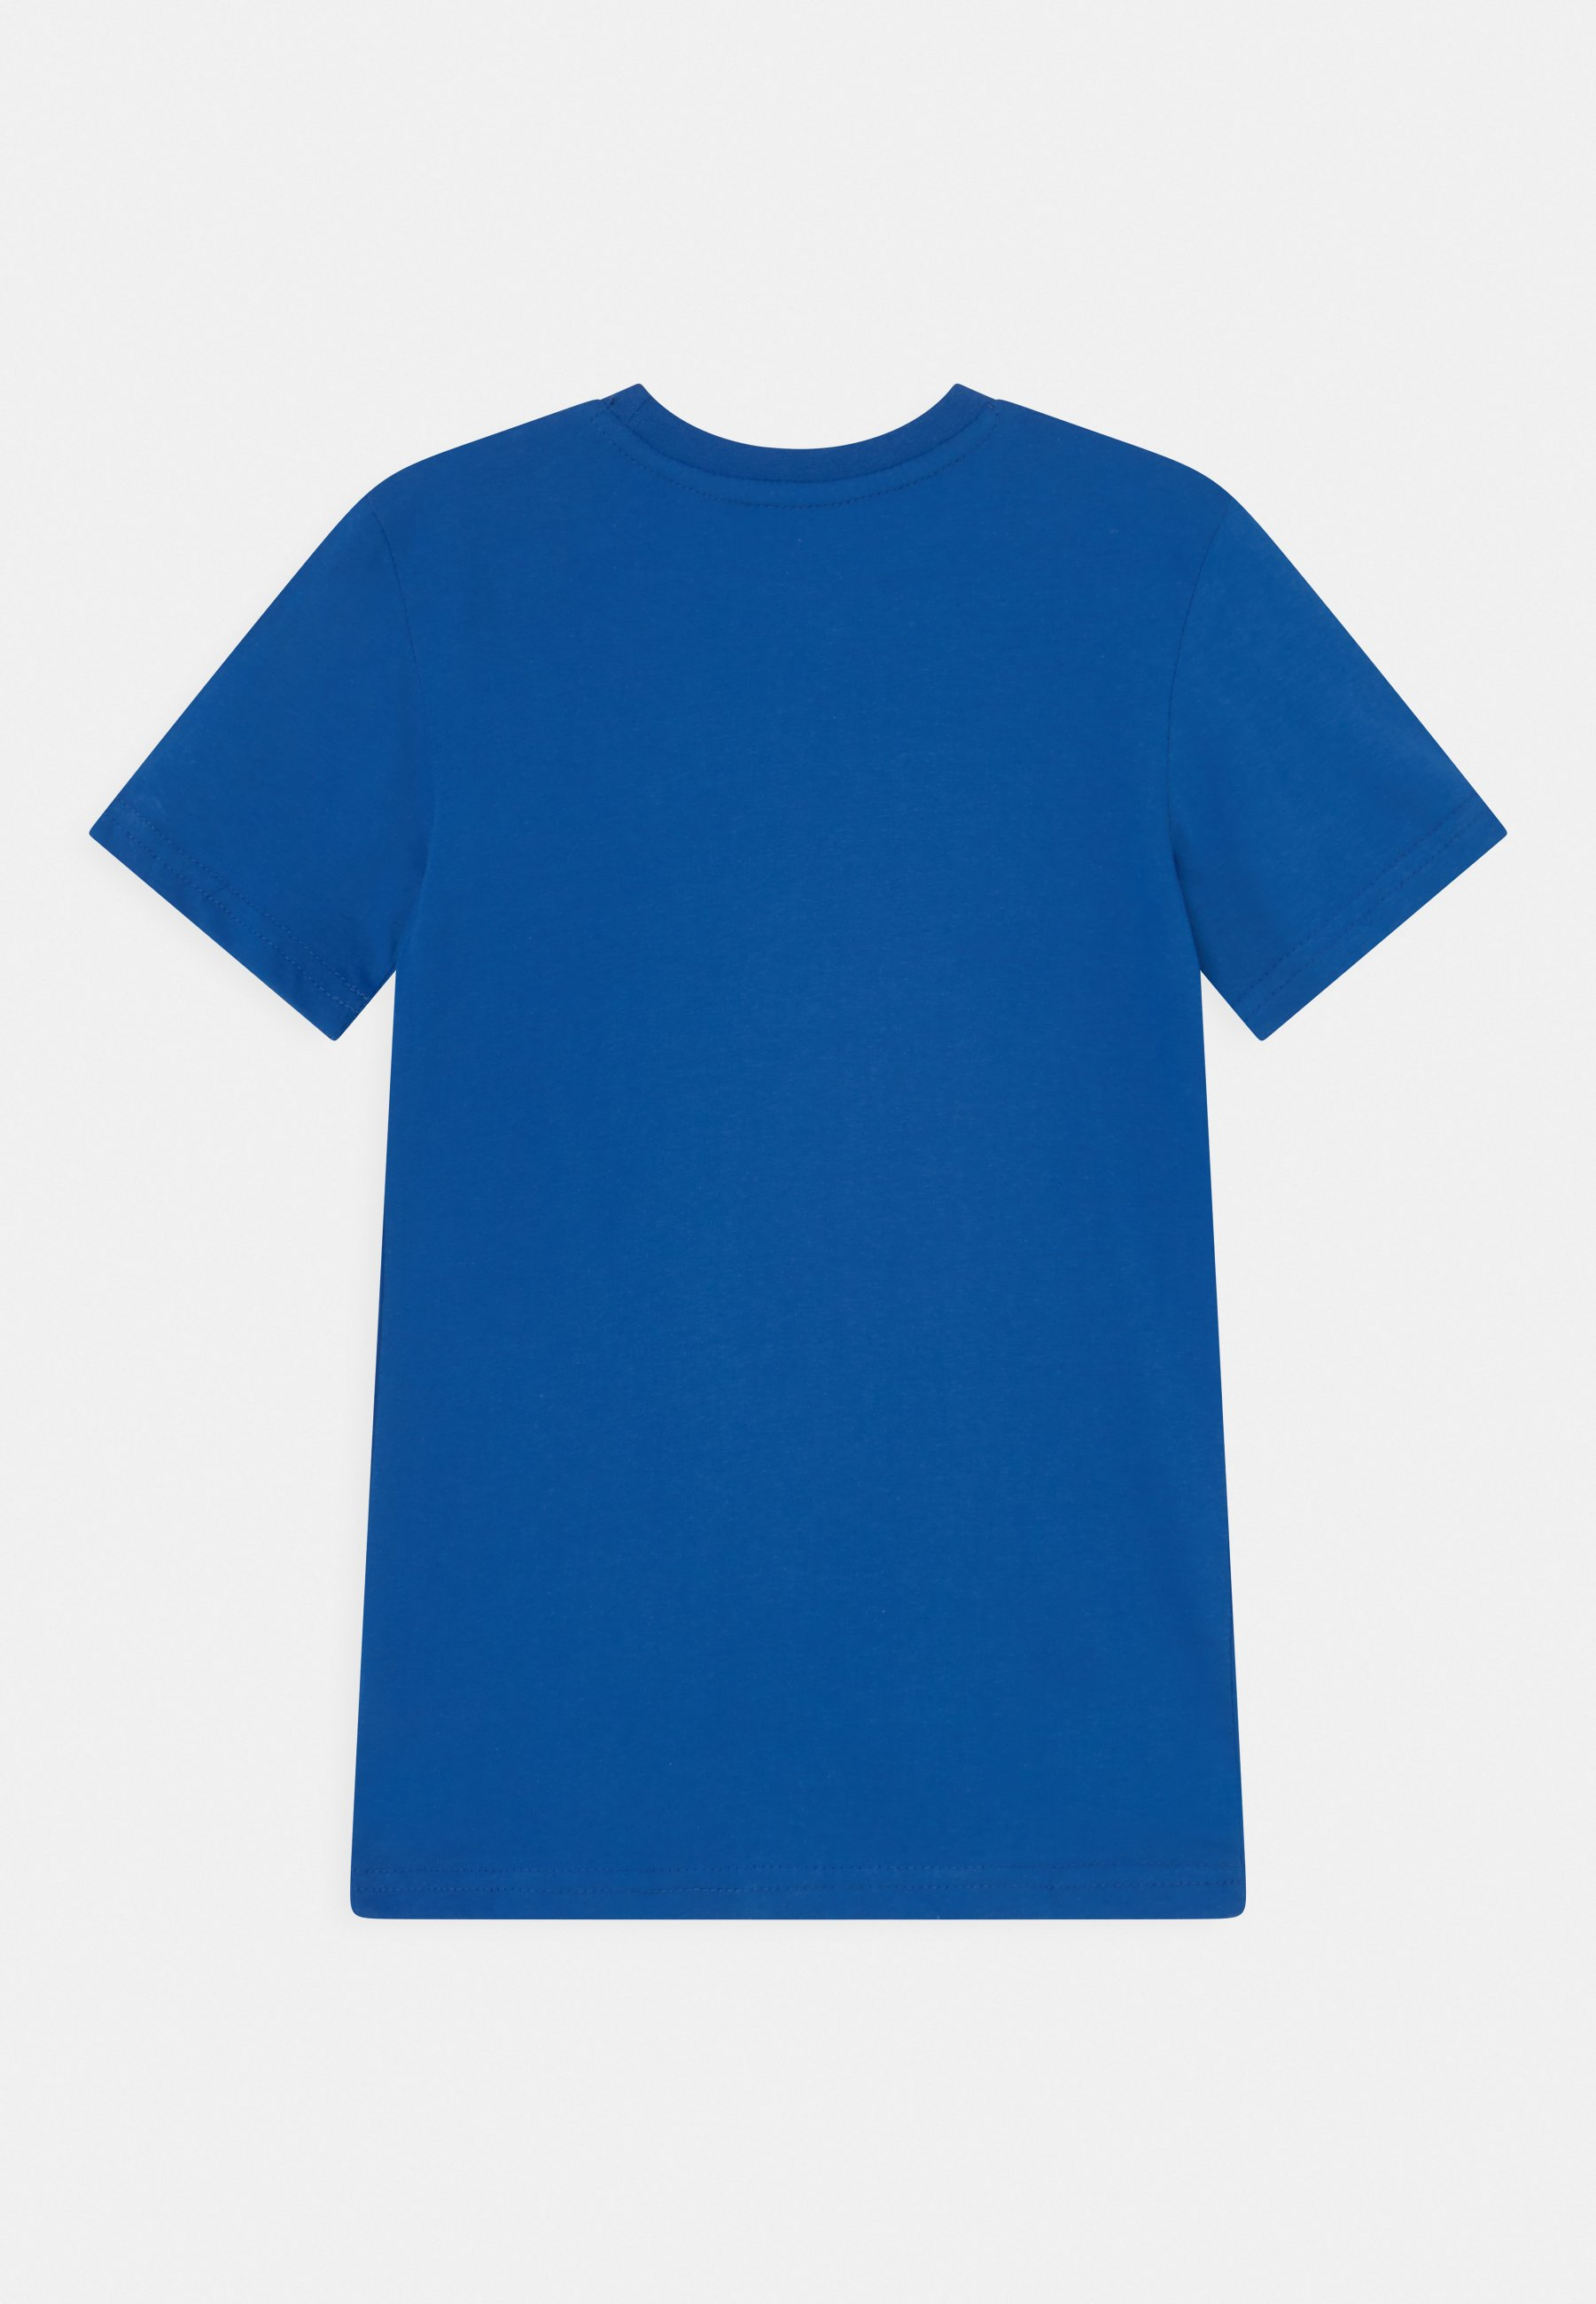 Bambini RAINBOW LOGO TEE UNISEX - T-shirt con stampa